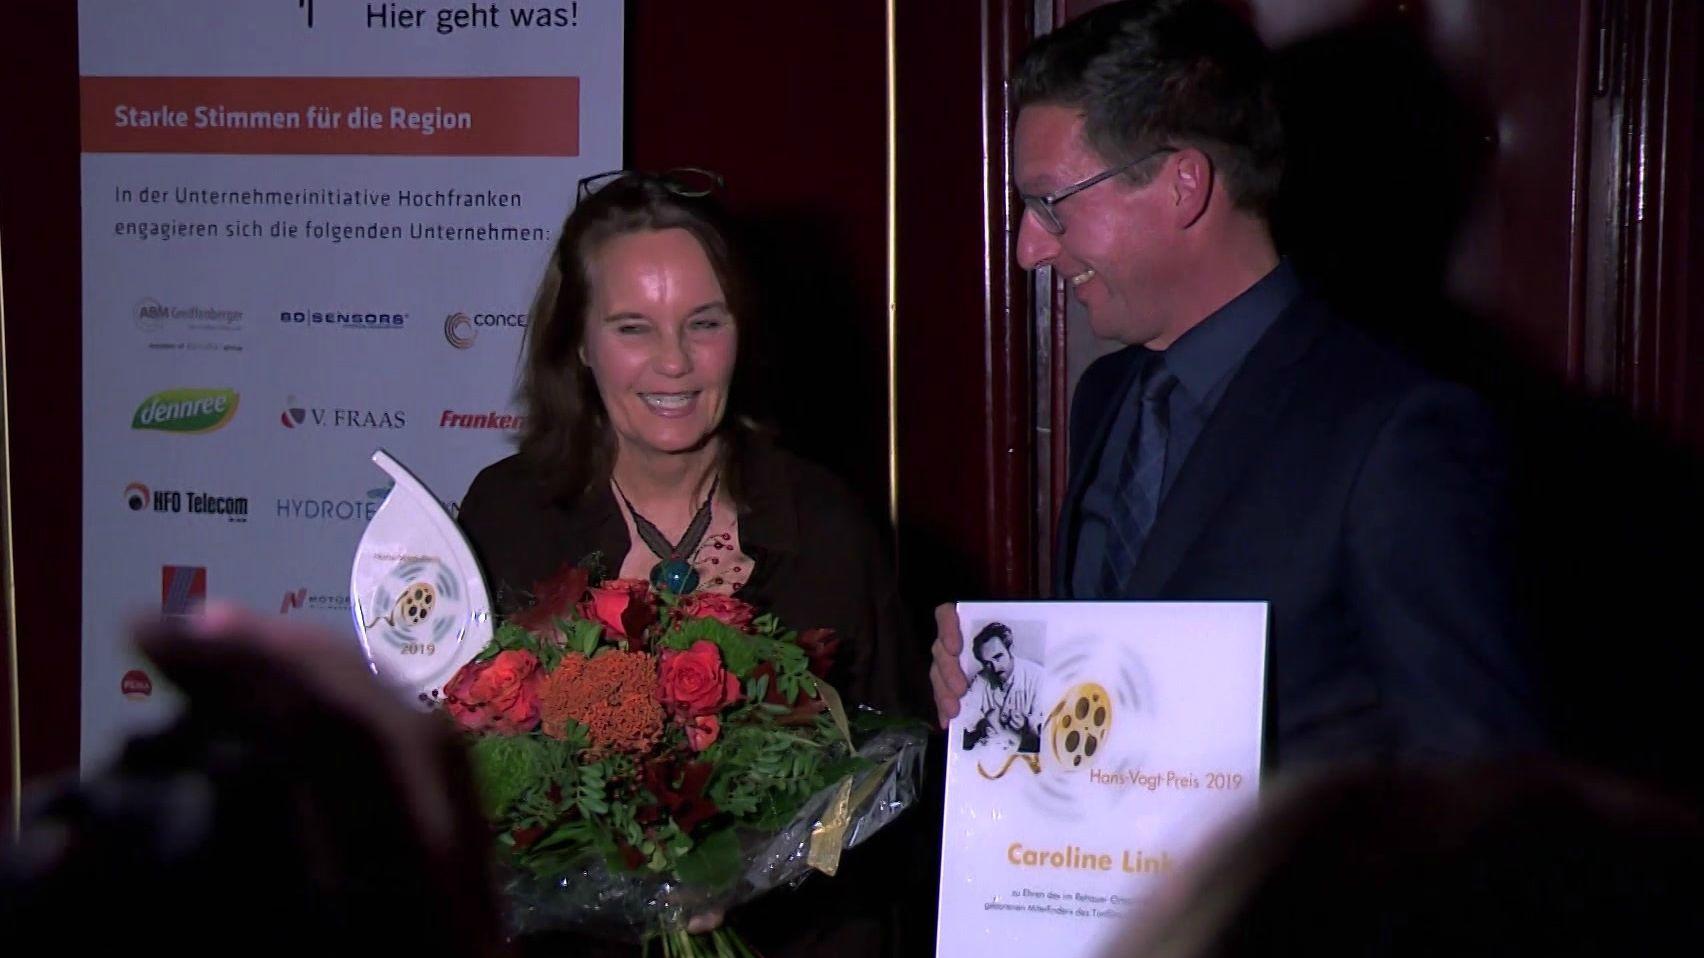 Filmpreis für Oscar-Preisträgerin Caroline Link